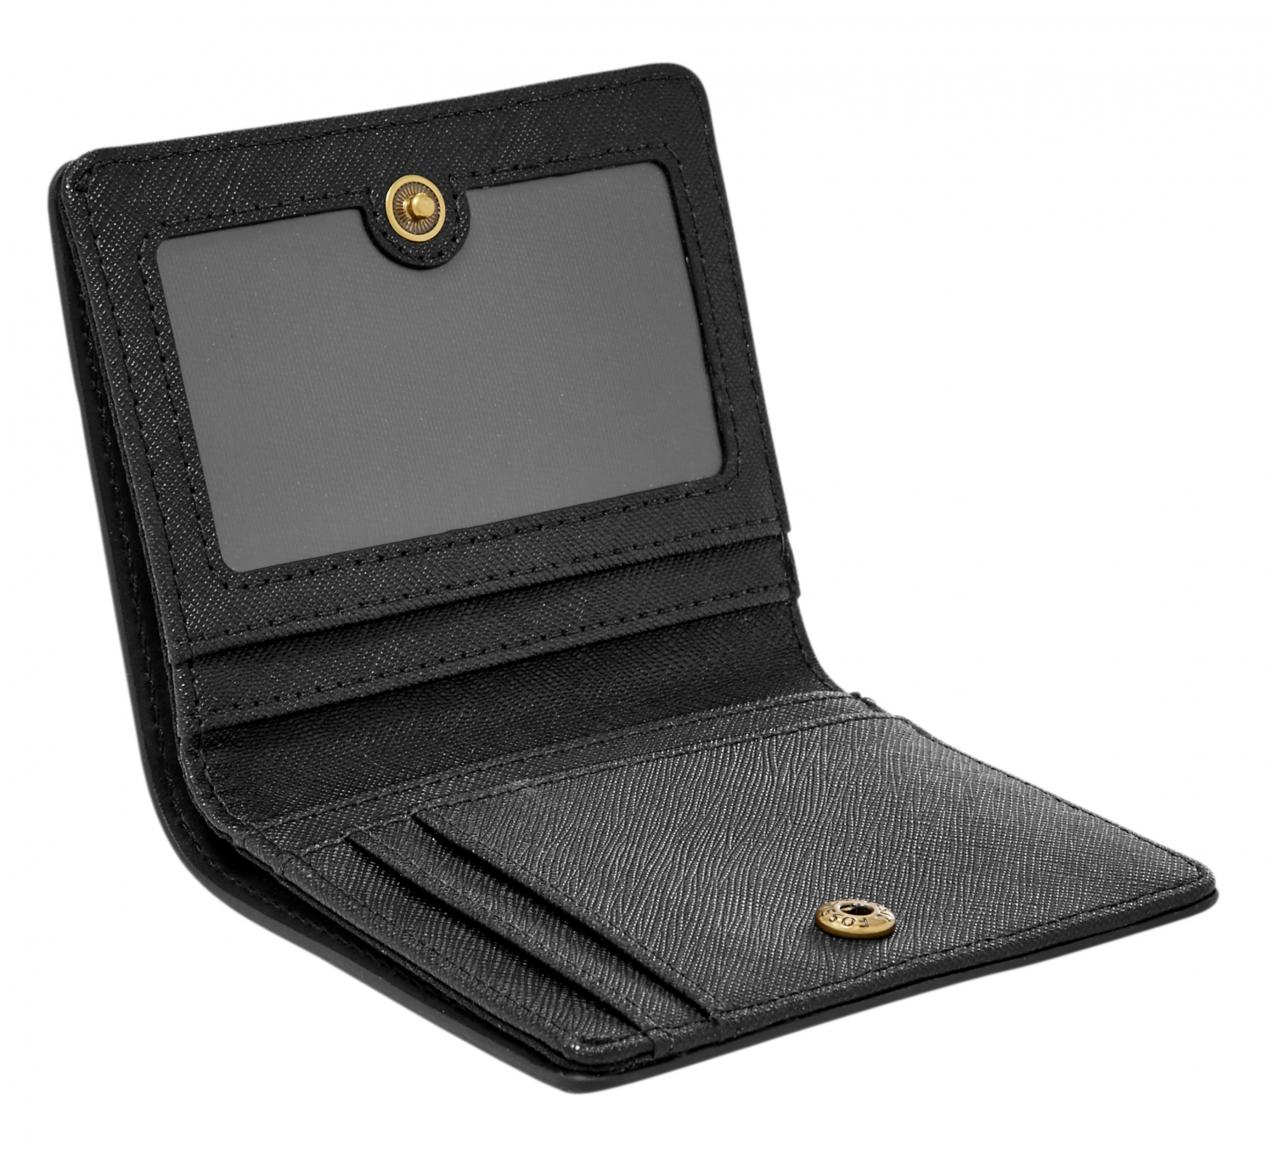 Fossil Geldbörse Emma Mini W RFID Protection Black Schwarz